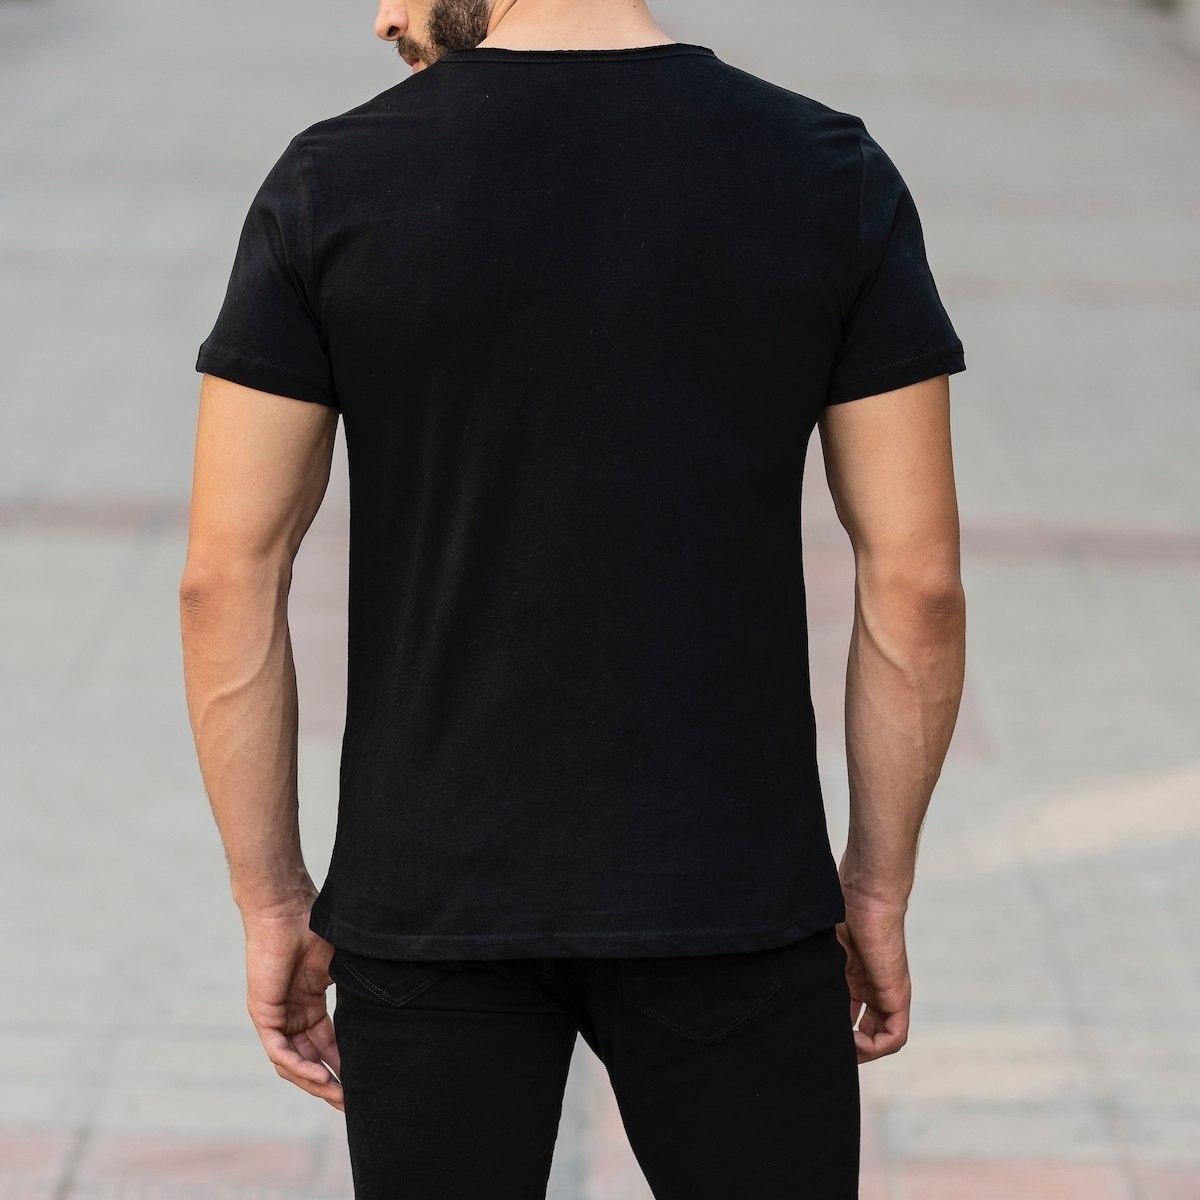 Croped Collar Black T-Shirt Mv Premium Brand - 5